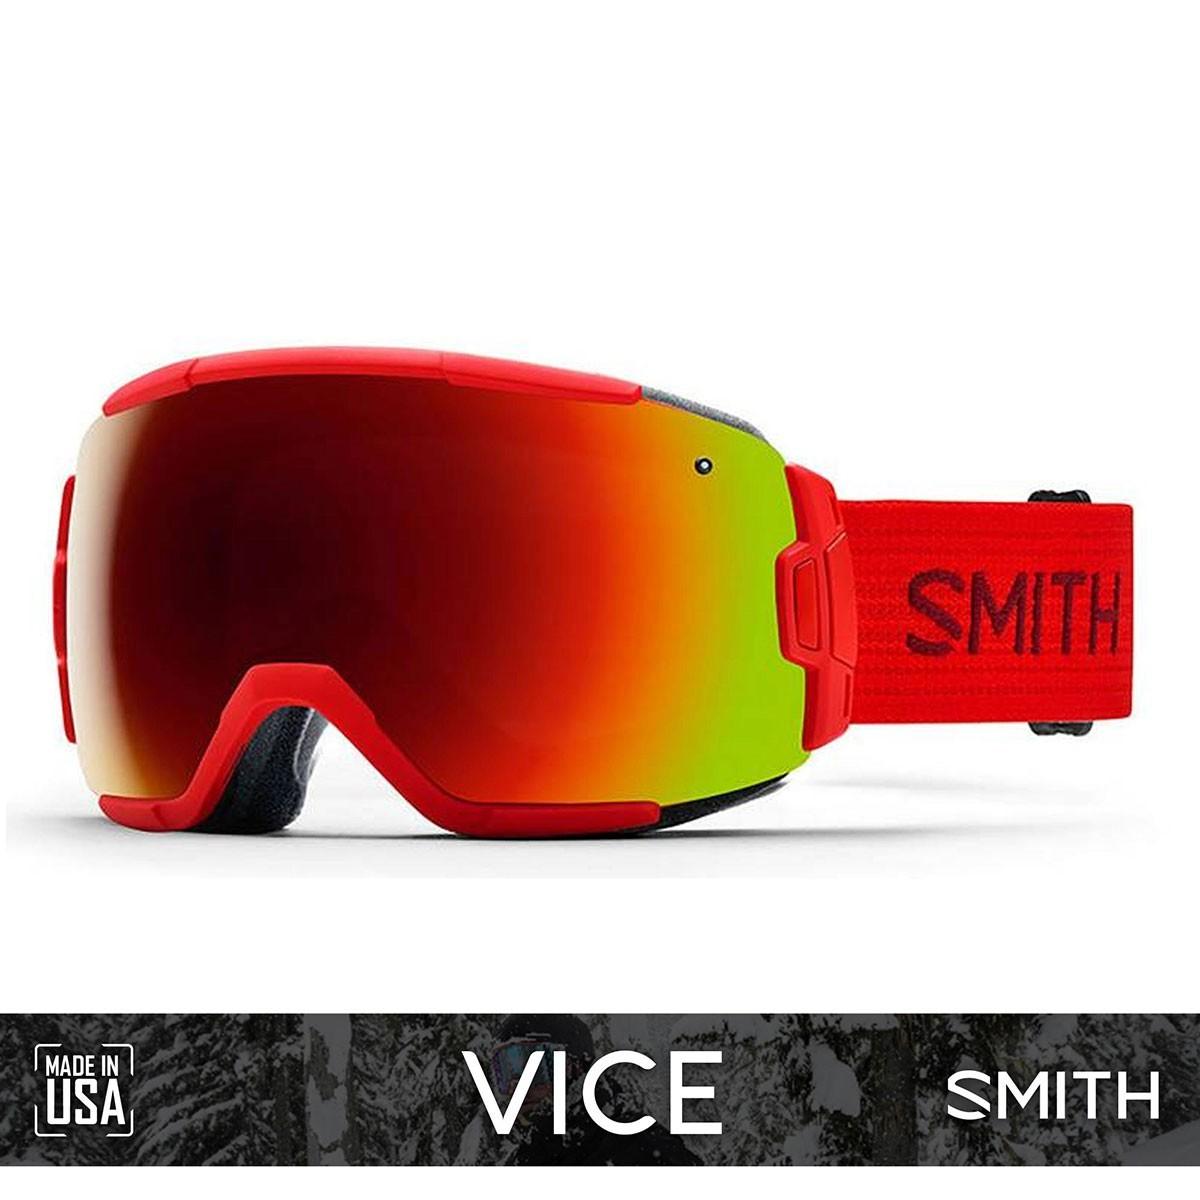 SMITH VICE Fire   S3 RED SOL-X Mirror - Изображение - AQUAMATRIX